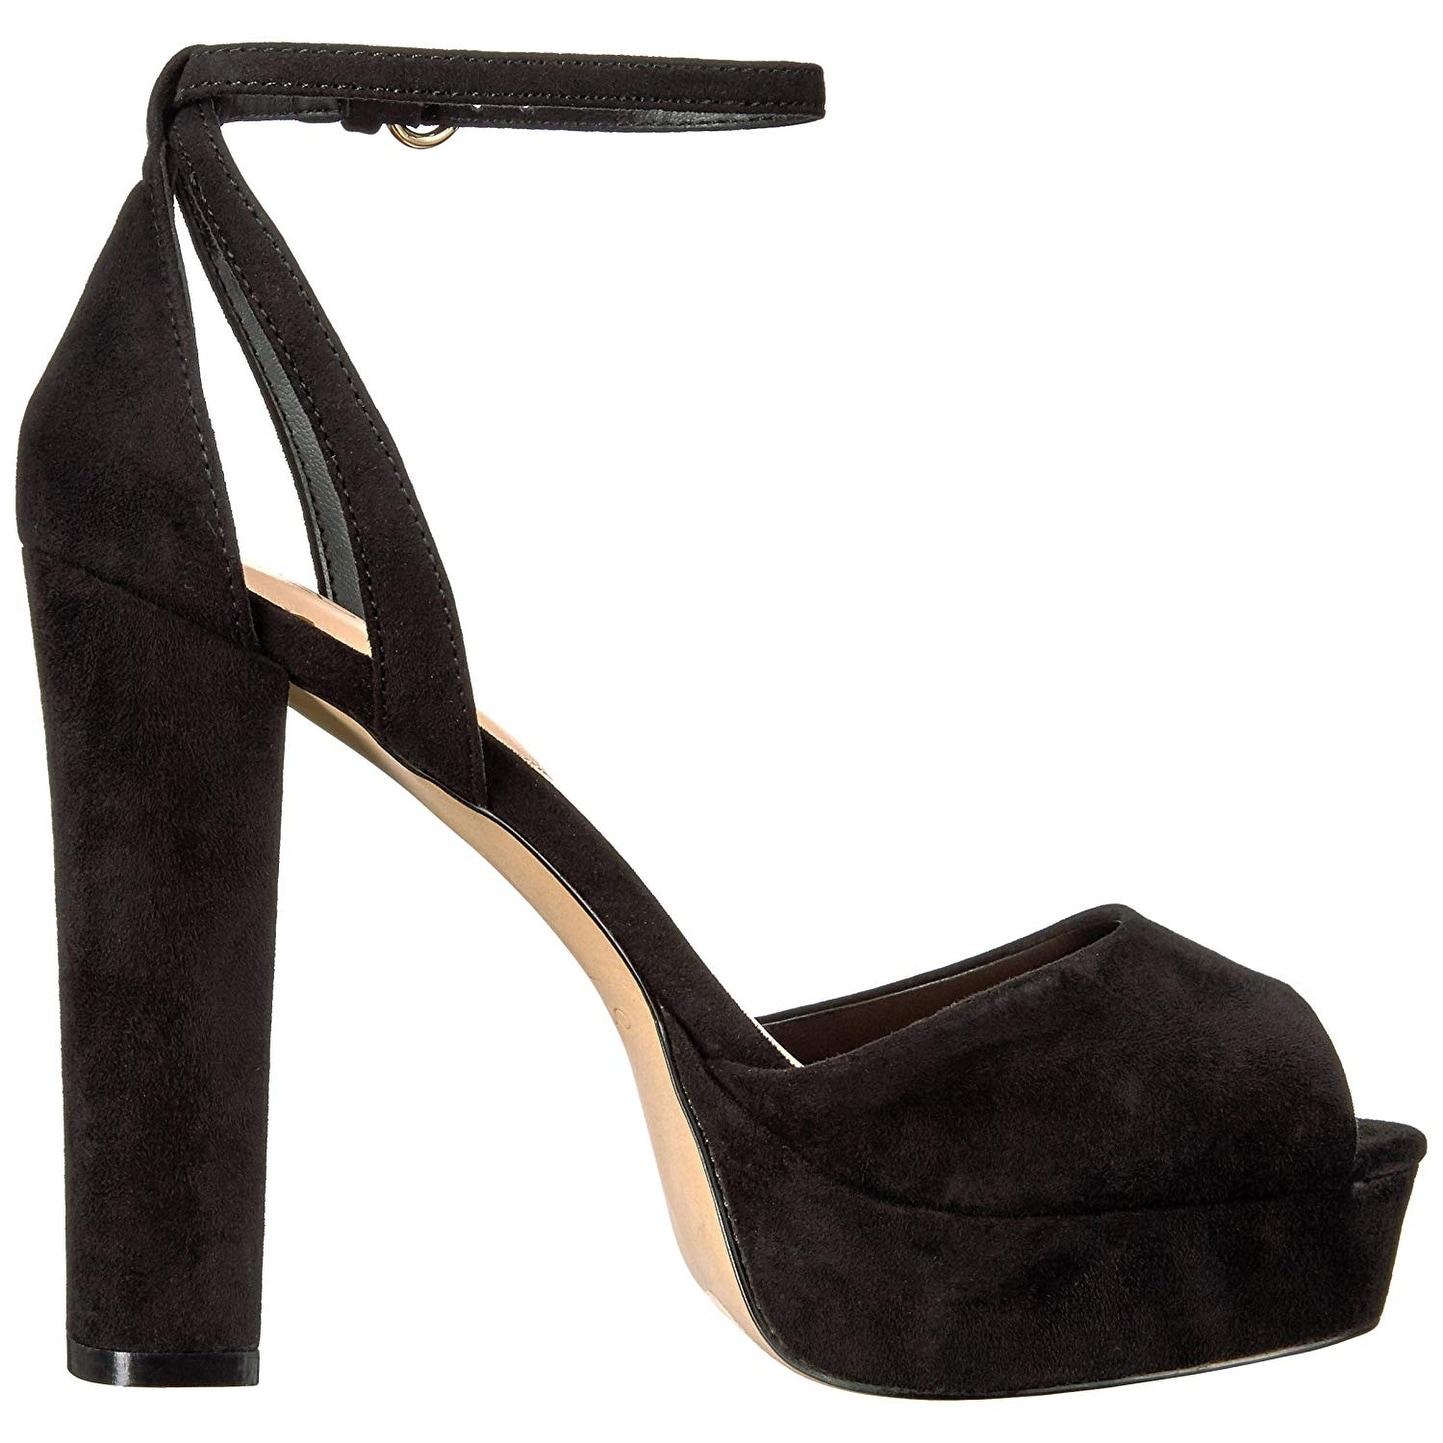 fc2bcbaf437 Shop Aldo Women s Olivarra Platform Sandal - 9 - Free Shipping Today -  Overstock - 24198376